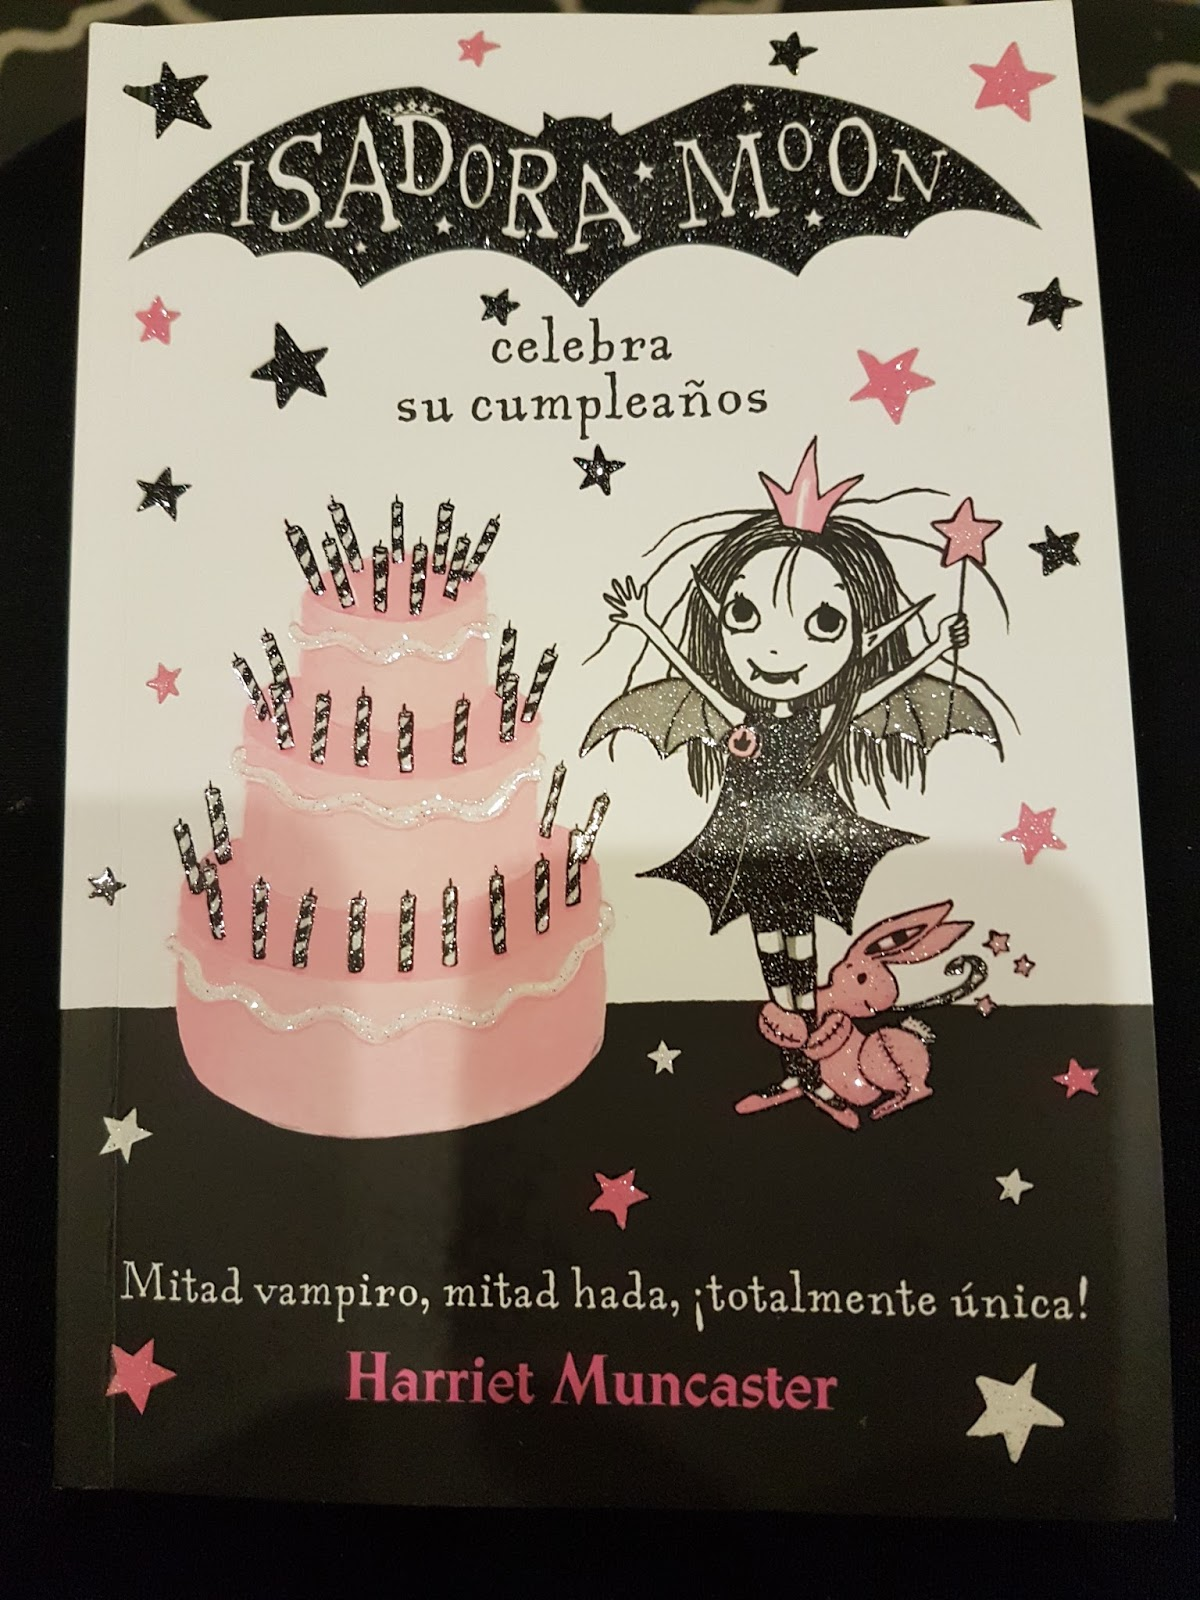 """Isadora Moon celebra su cumpleaños"" - Harriet Muncaster"